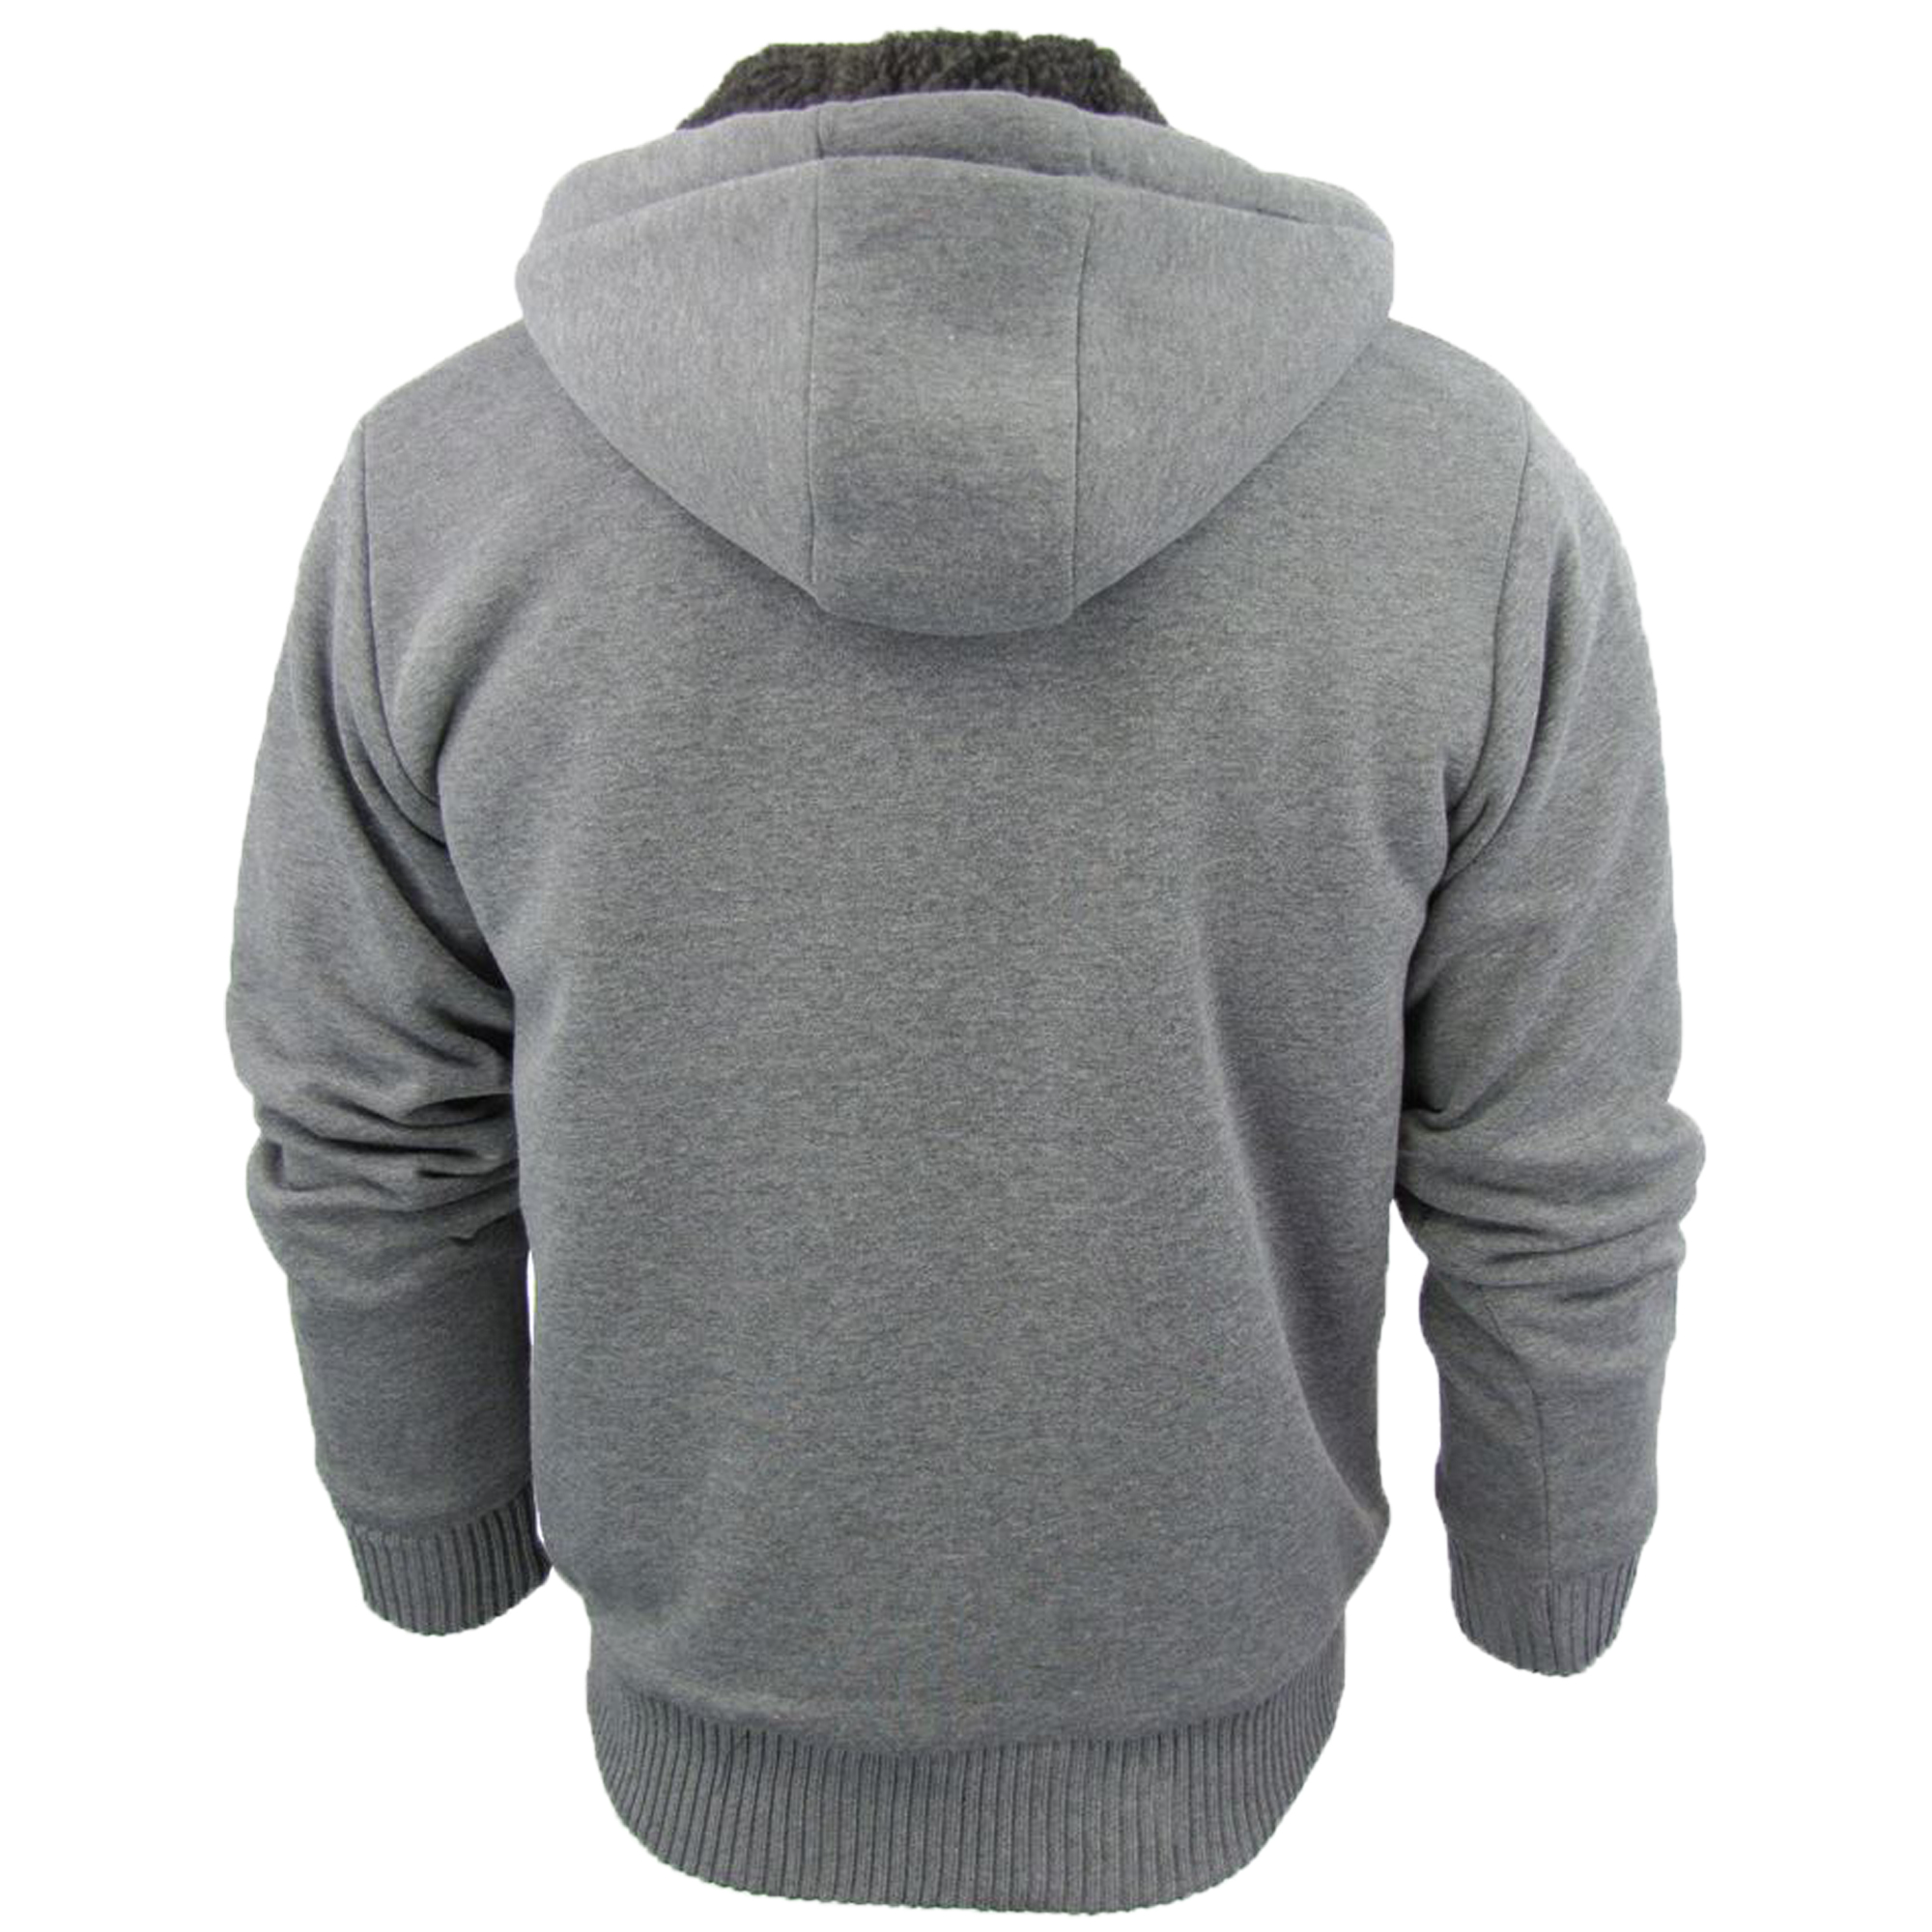 Mens-Jacket-Dissident-Sweatshirt-Hooded-Top-Sherpa-Fleece-Lined-Heavy-BOLO-New thumbnail 13